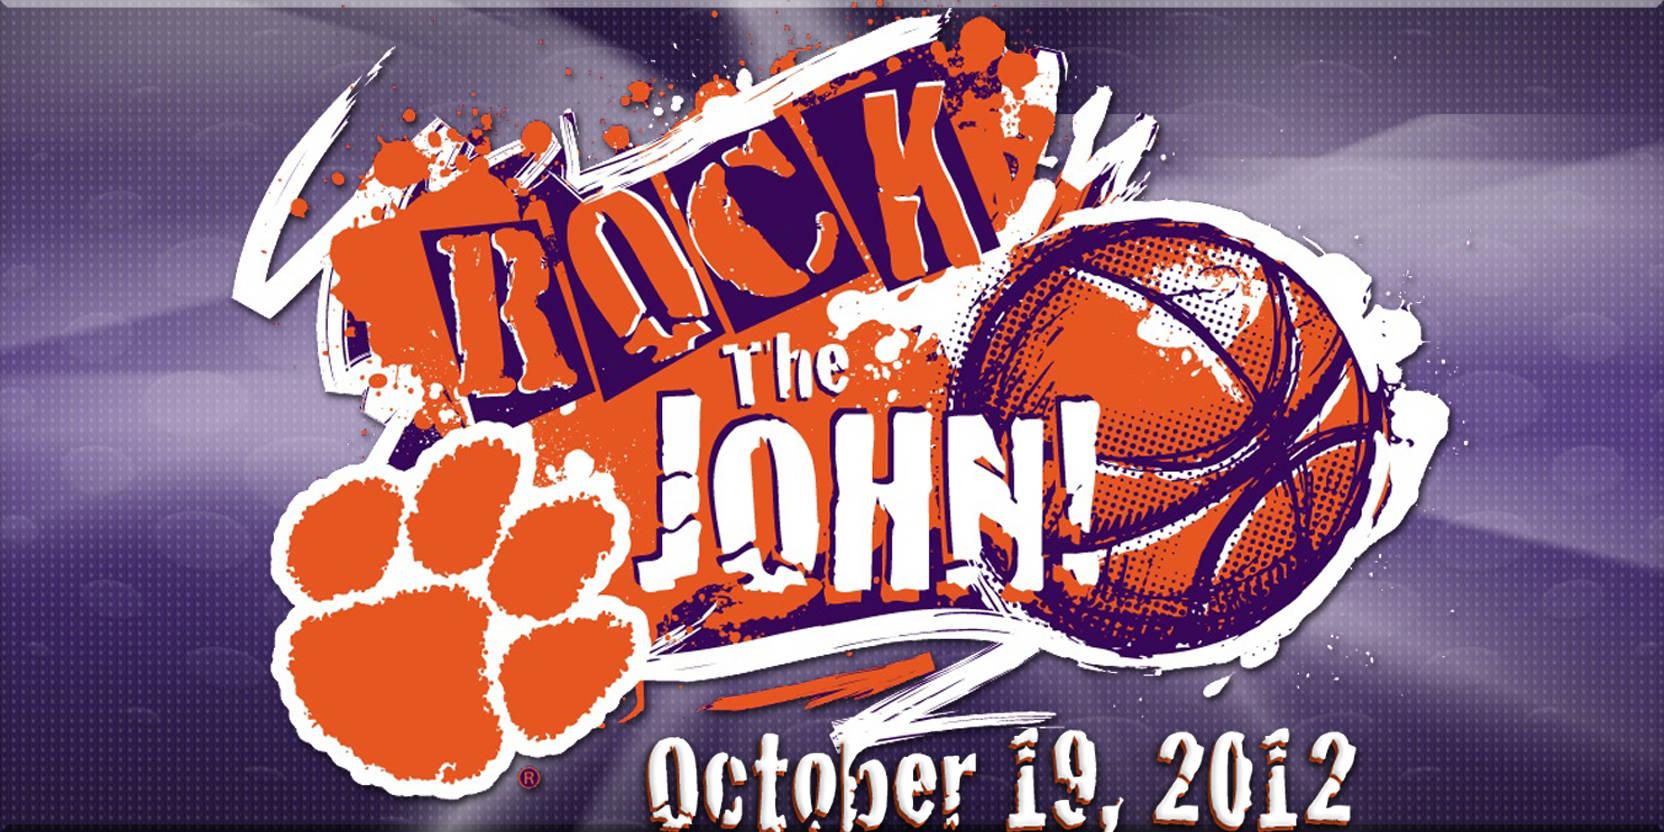 Tip Off the 2012-13 Basketball Season with Rock the 'John